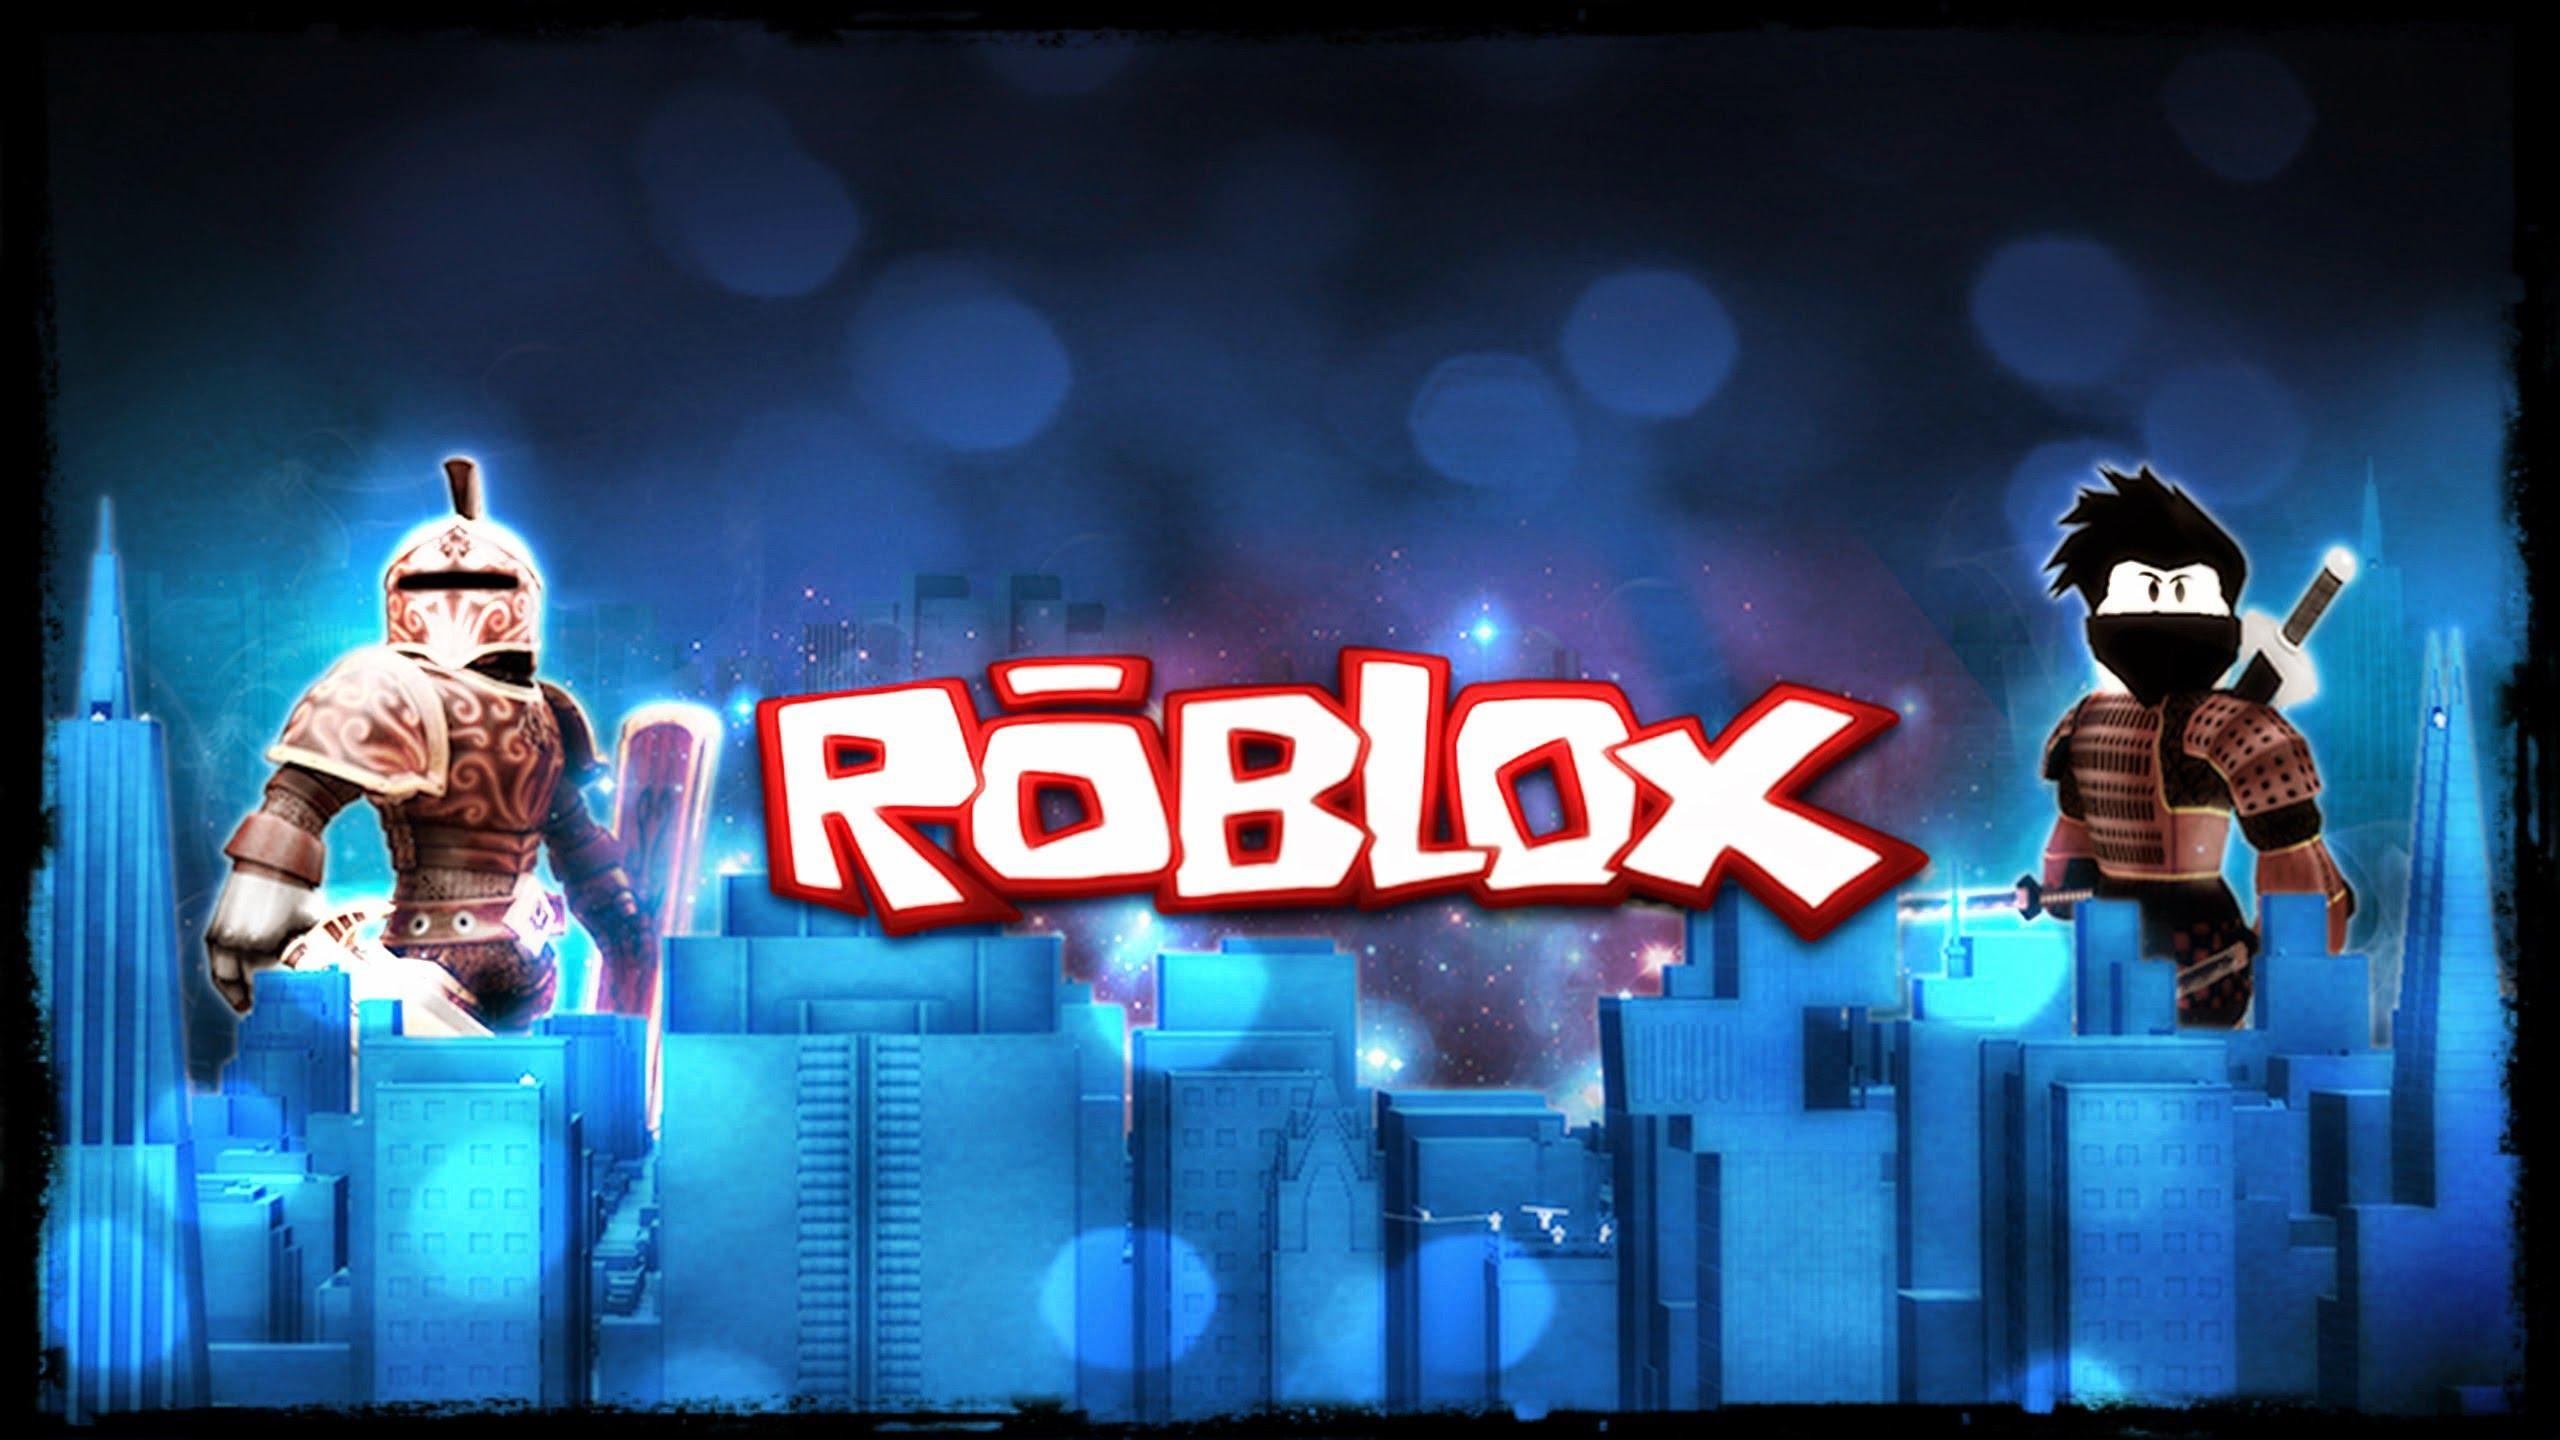 2560x1440 Exceptional Hexagon Bathroom Tile #5 - Roblox YouTube Backround .